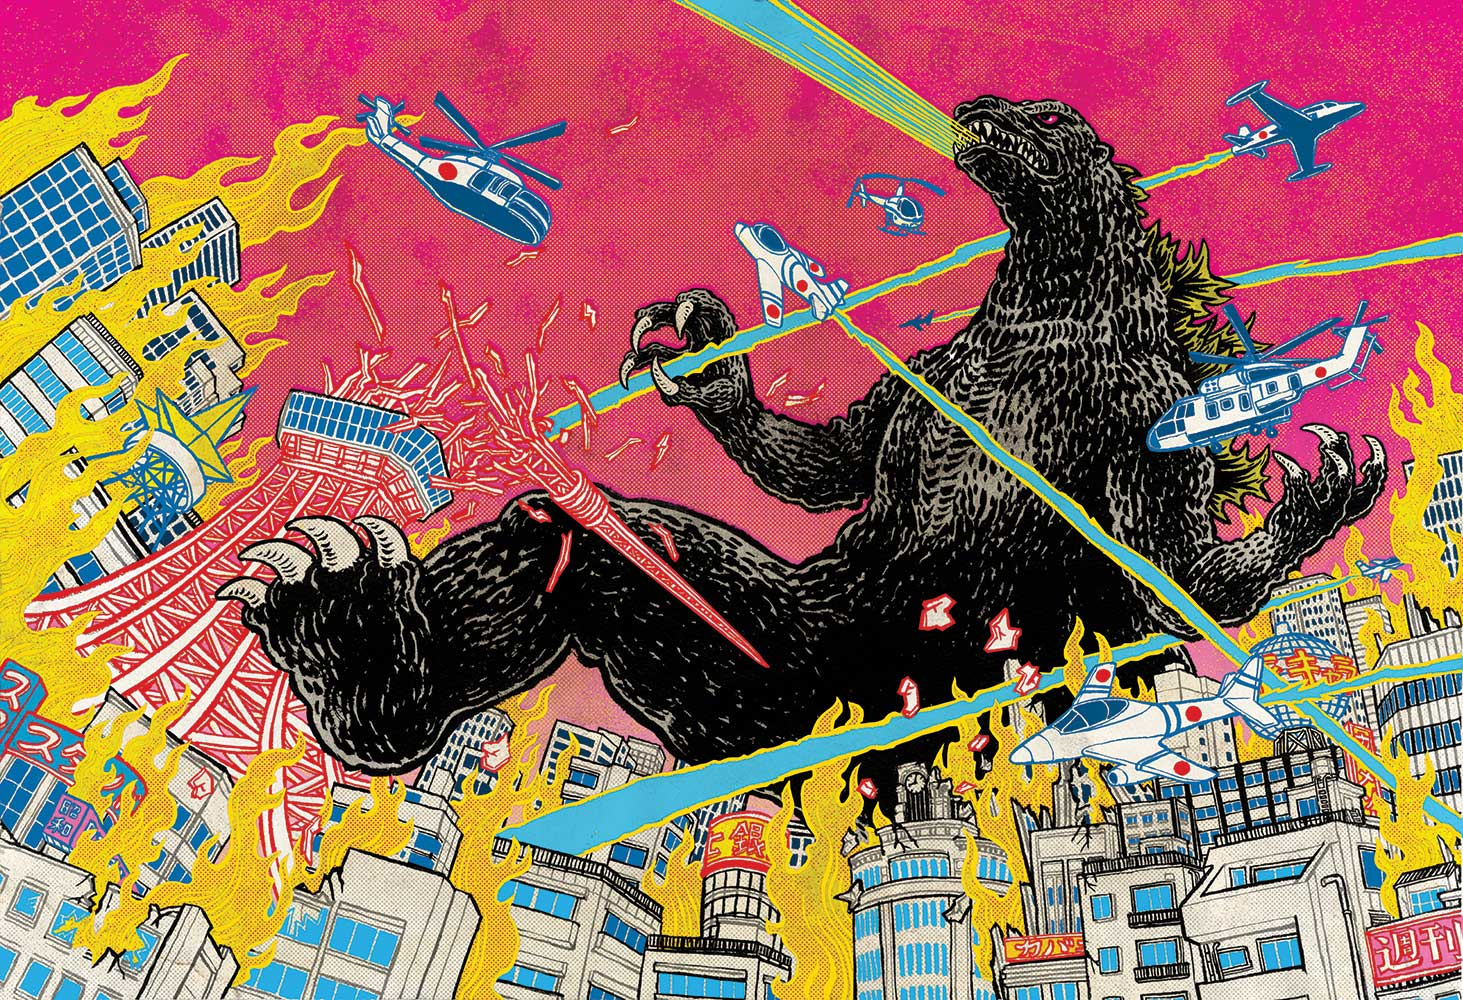 Godzilla_criterion_collection_spread_Yuko_Shimizu